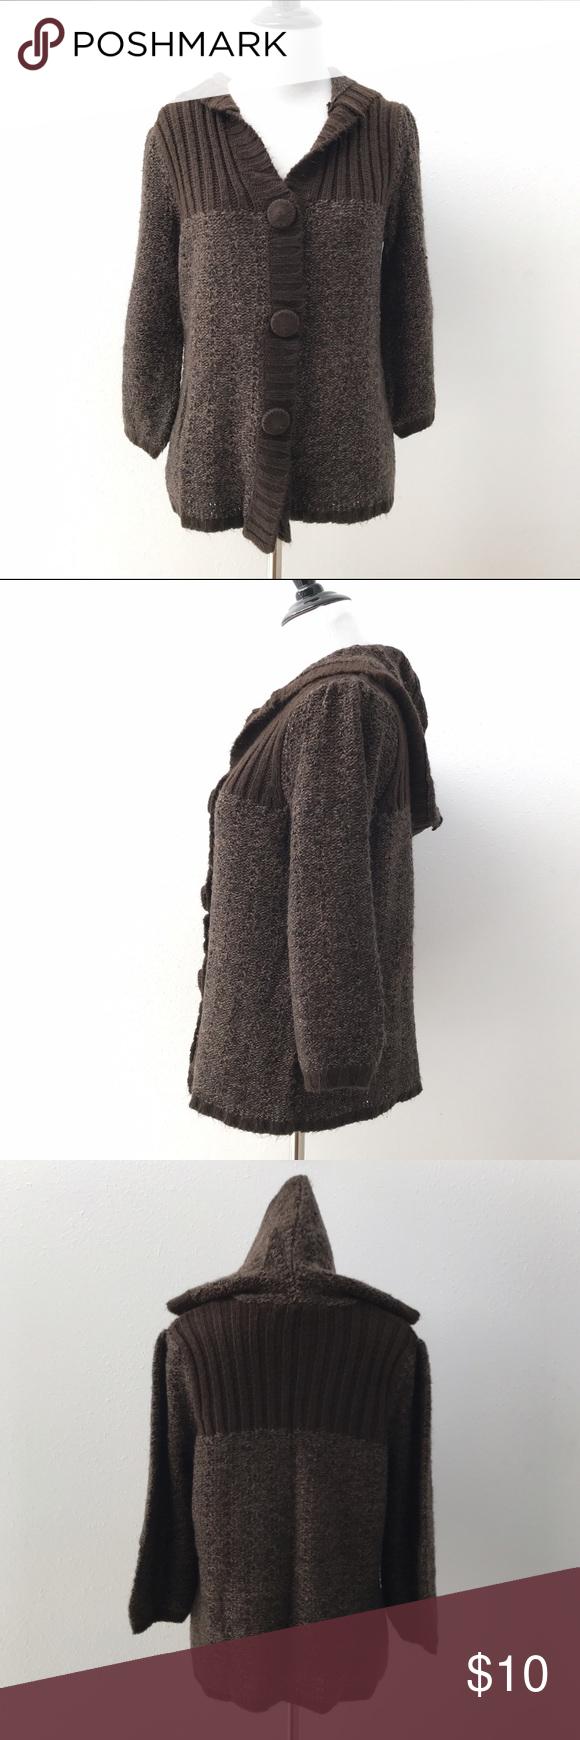 Long sleeve button down sweater Super soft dark brown button down ...